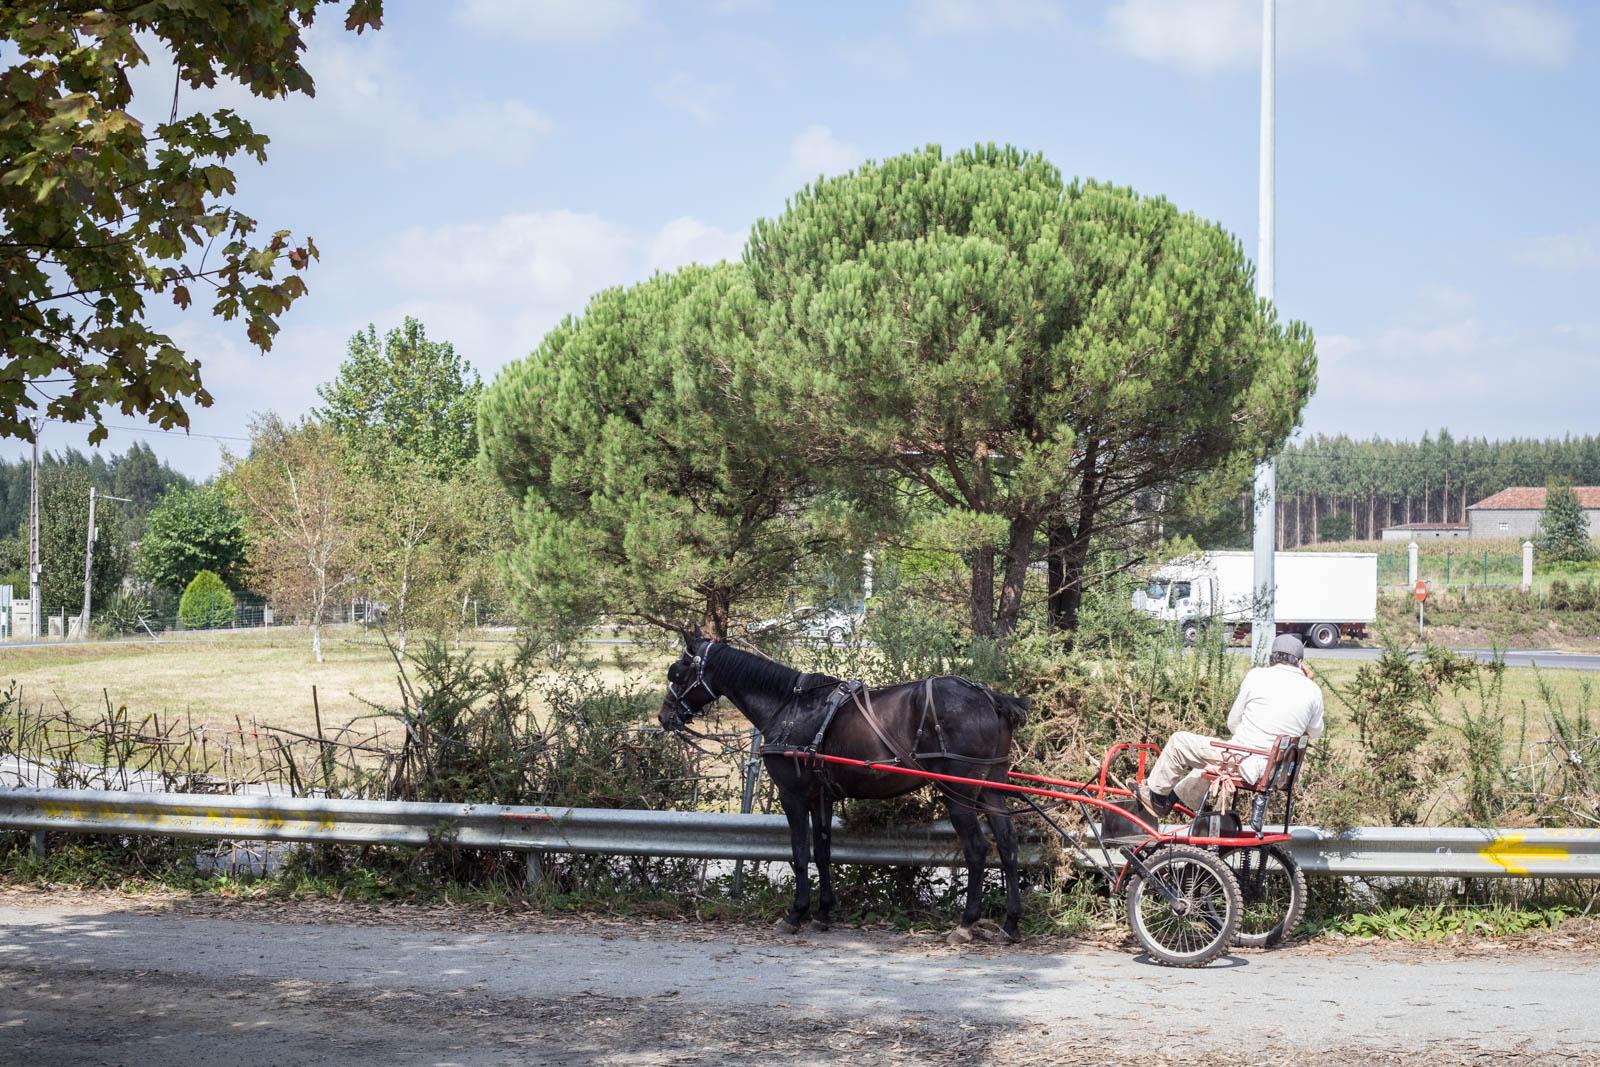 Un peregrino a caballo muy cómodo